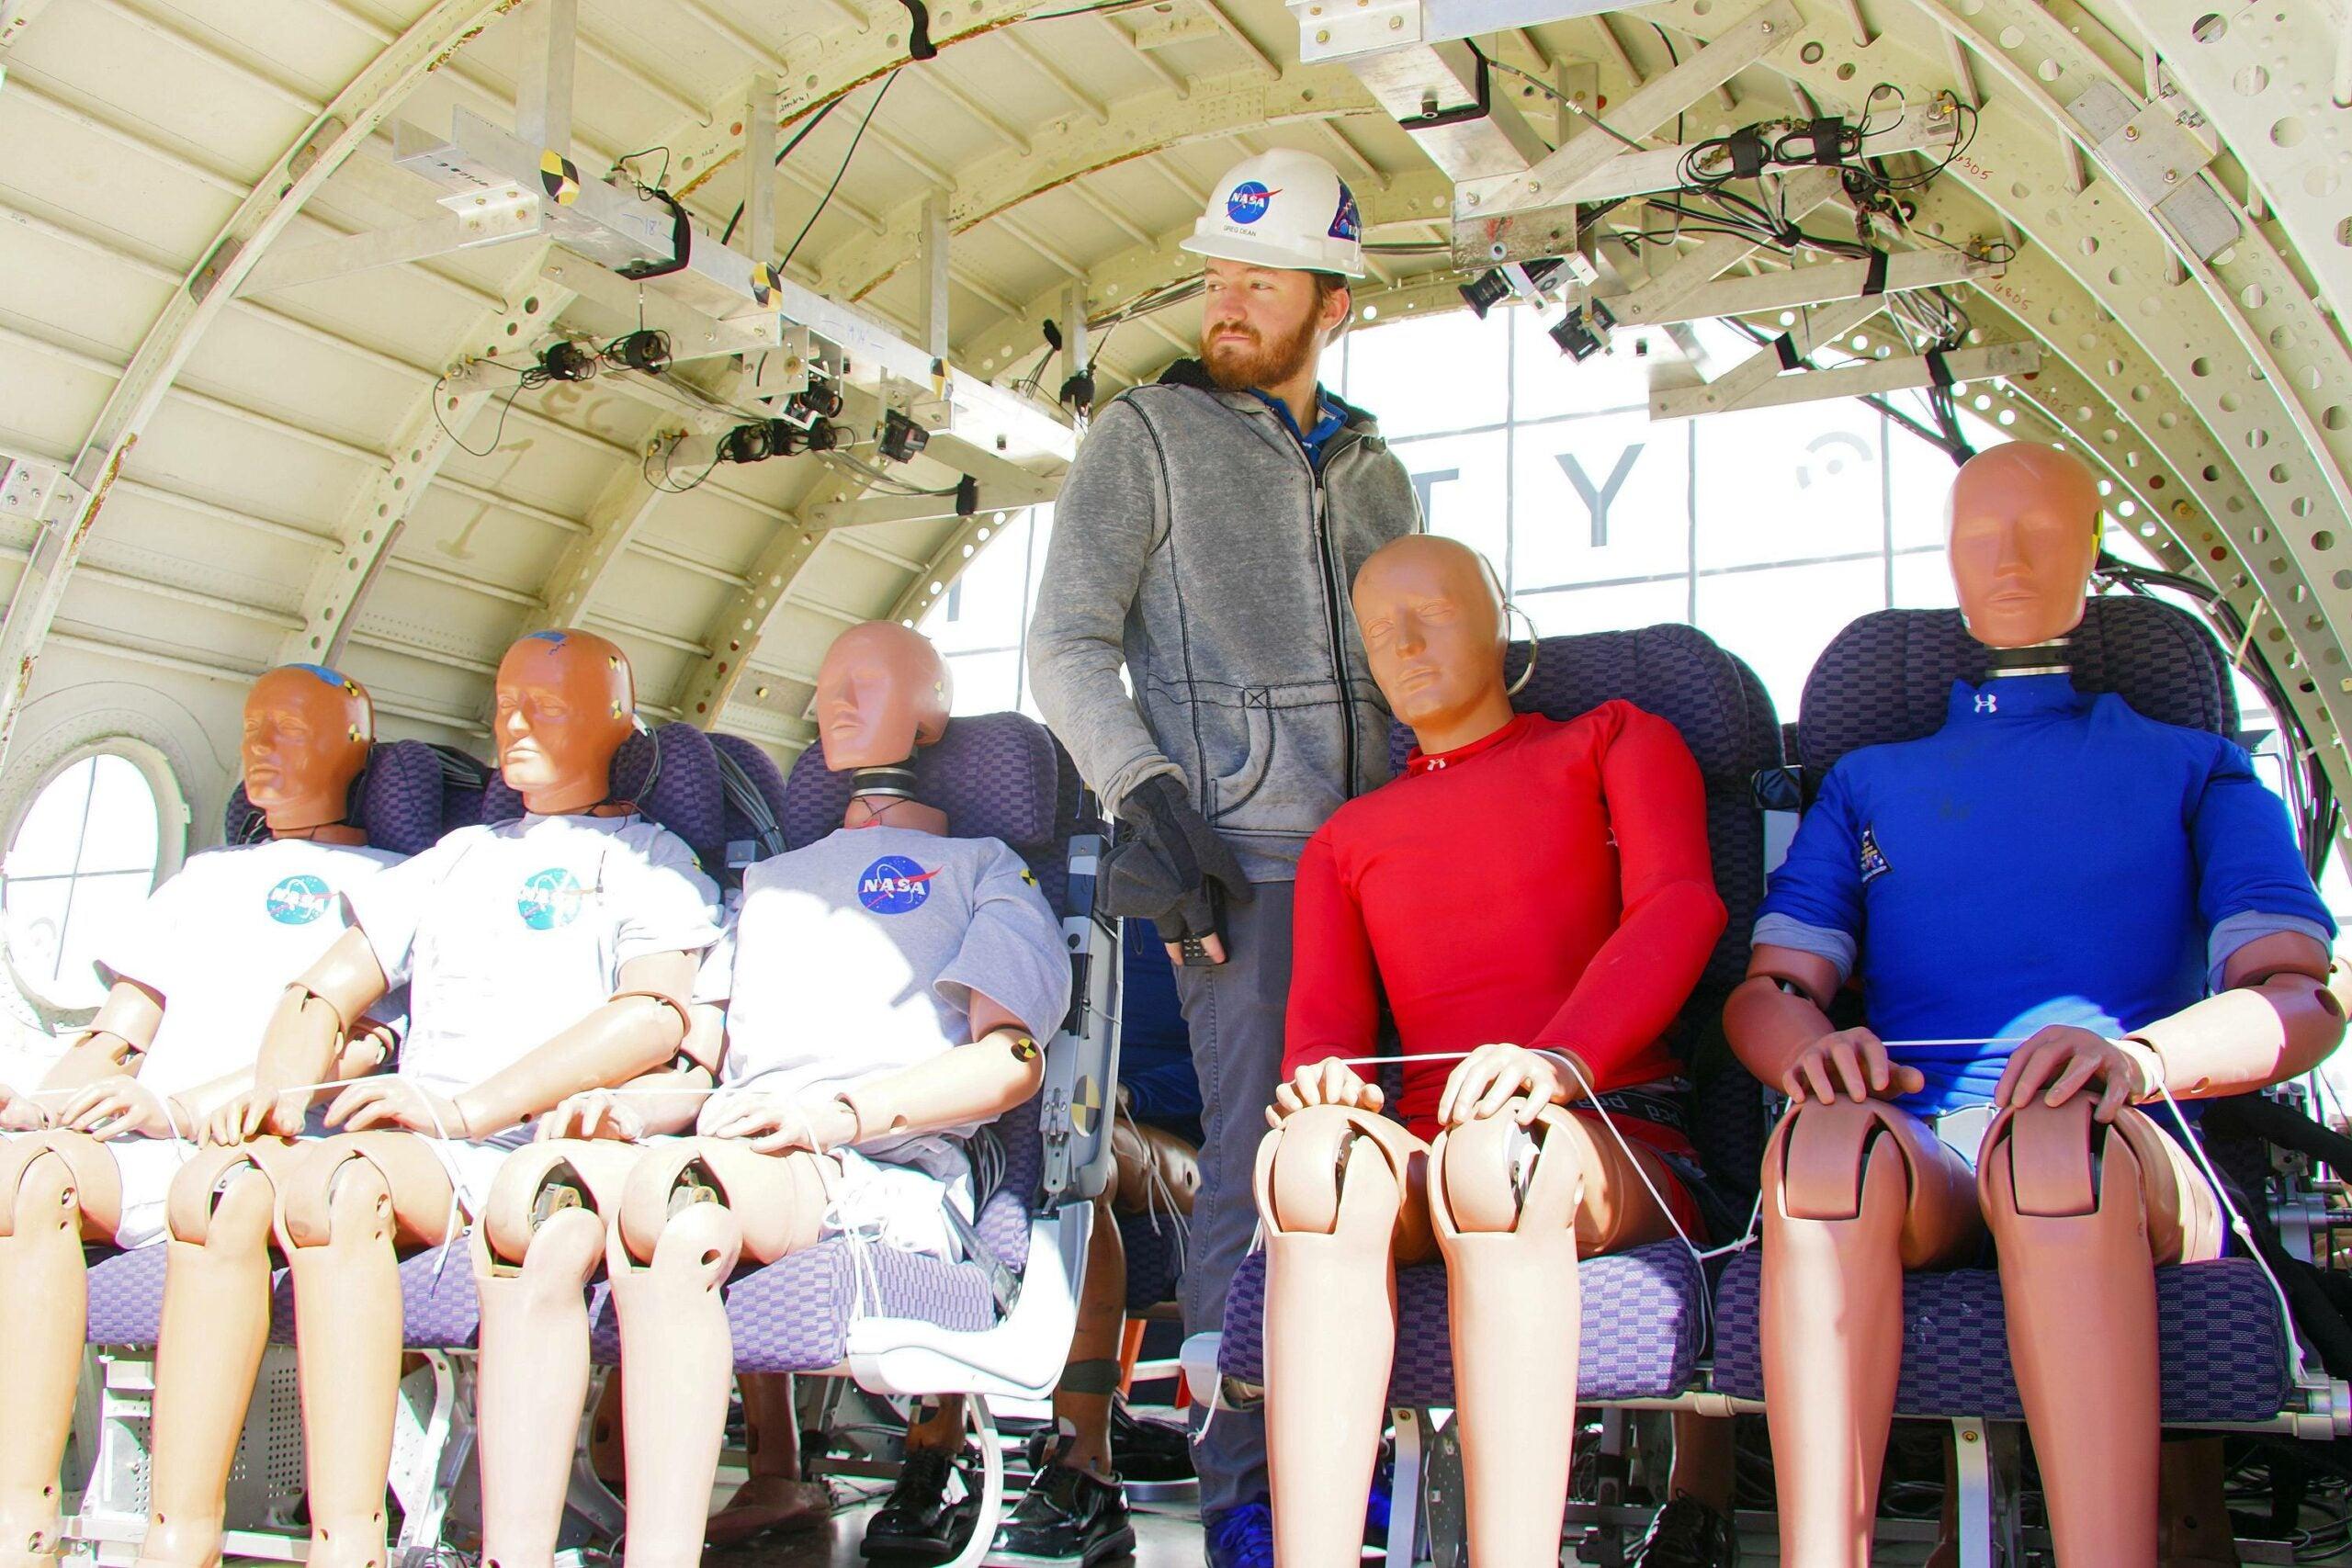 NASA dummies test